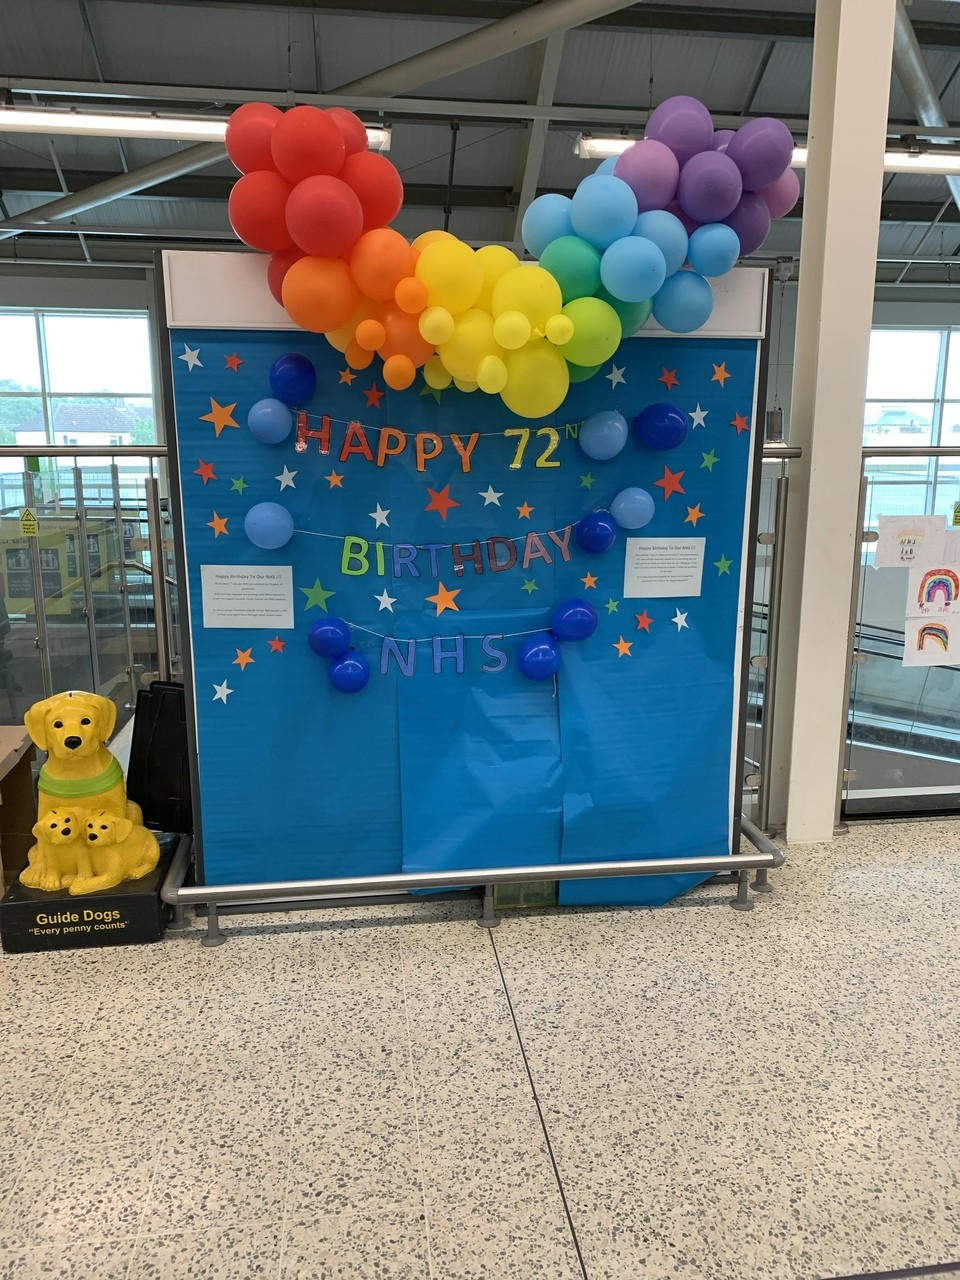 Happy birthday NHS | Asda Ware